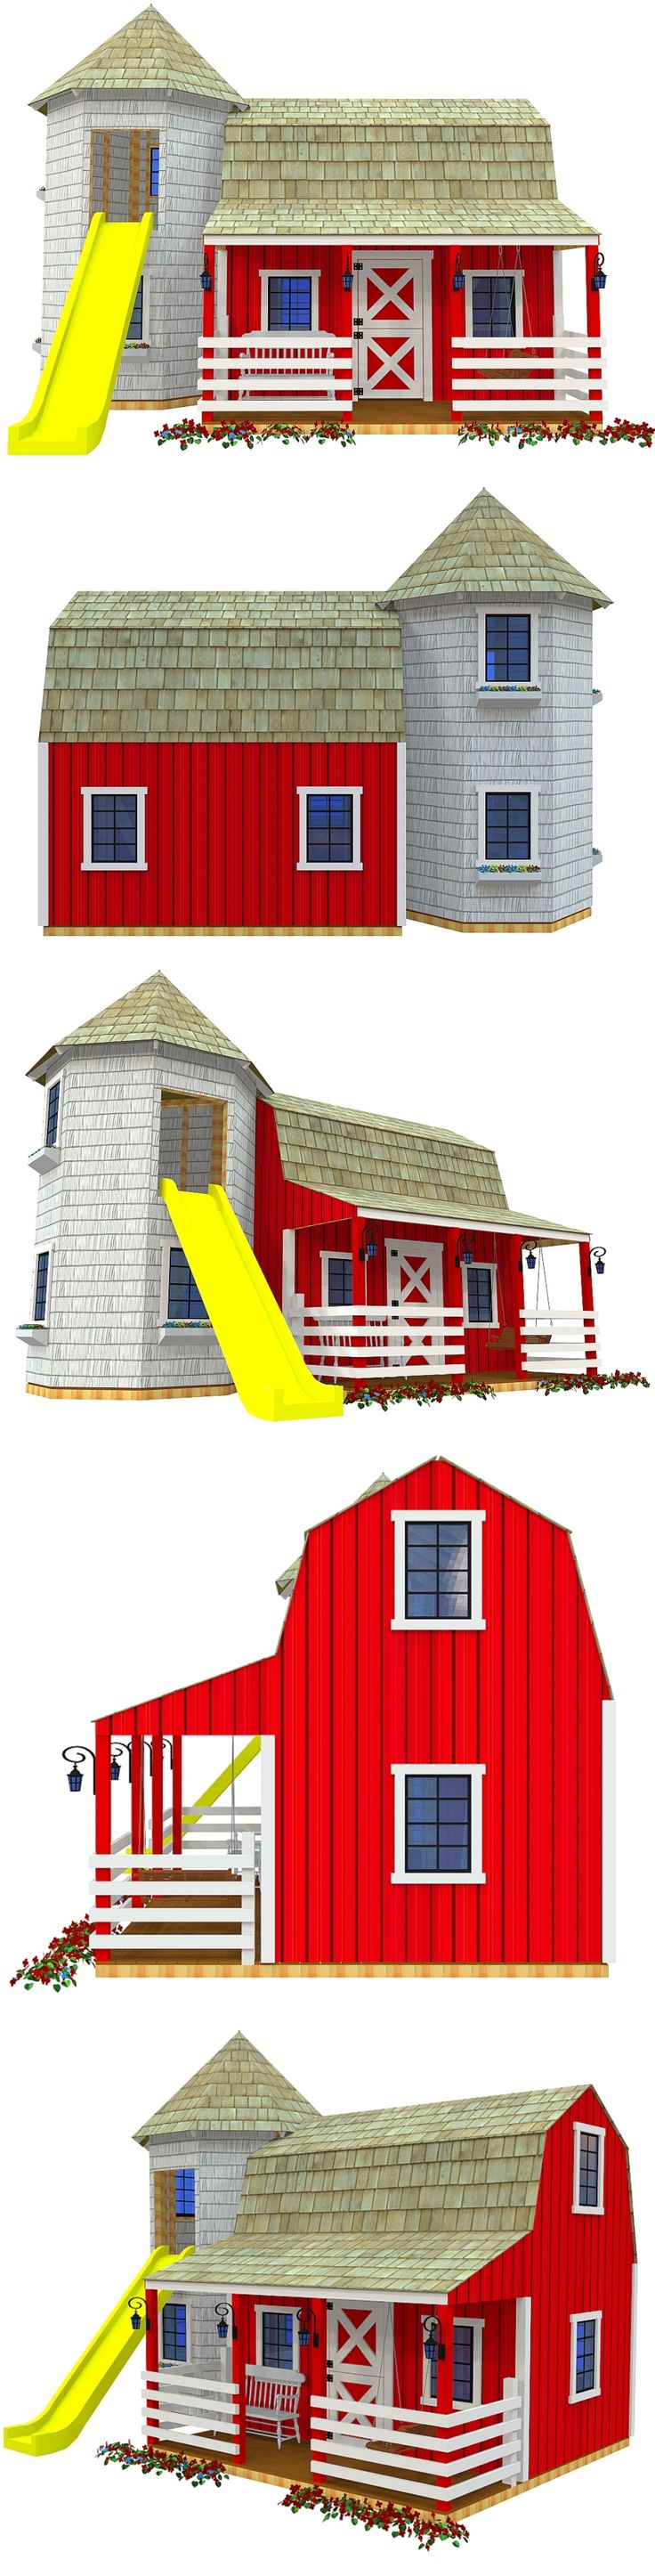 The Barn & Silo playhouse plan, hosted on paulsplayhouses.com